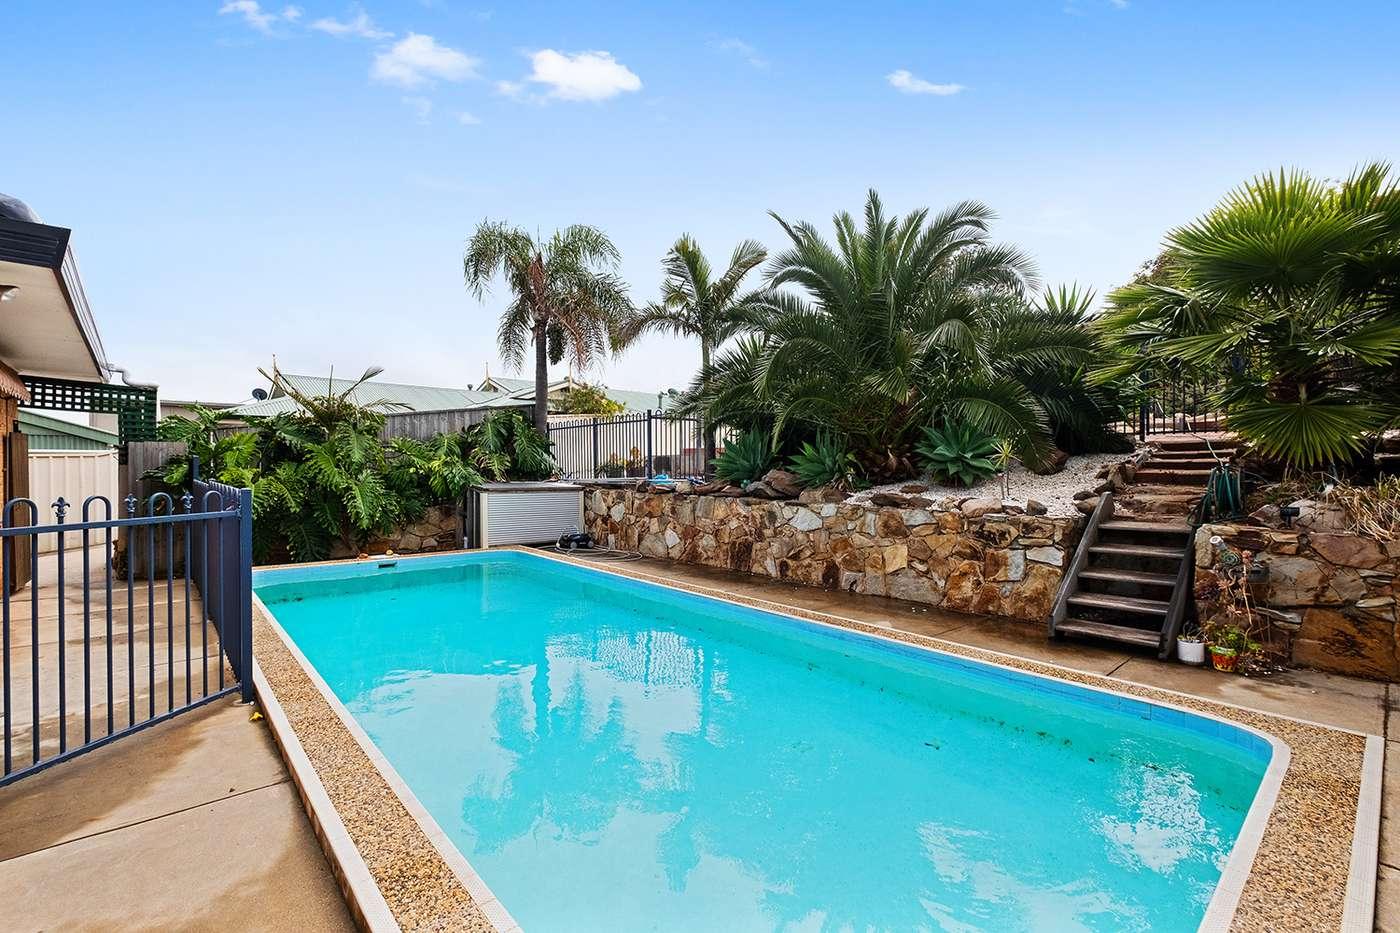 Main view of Homely house listing, 8 John Street, Seacliff Park, SA 5049